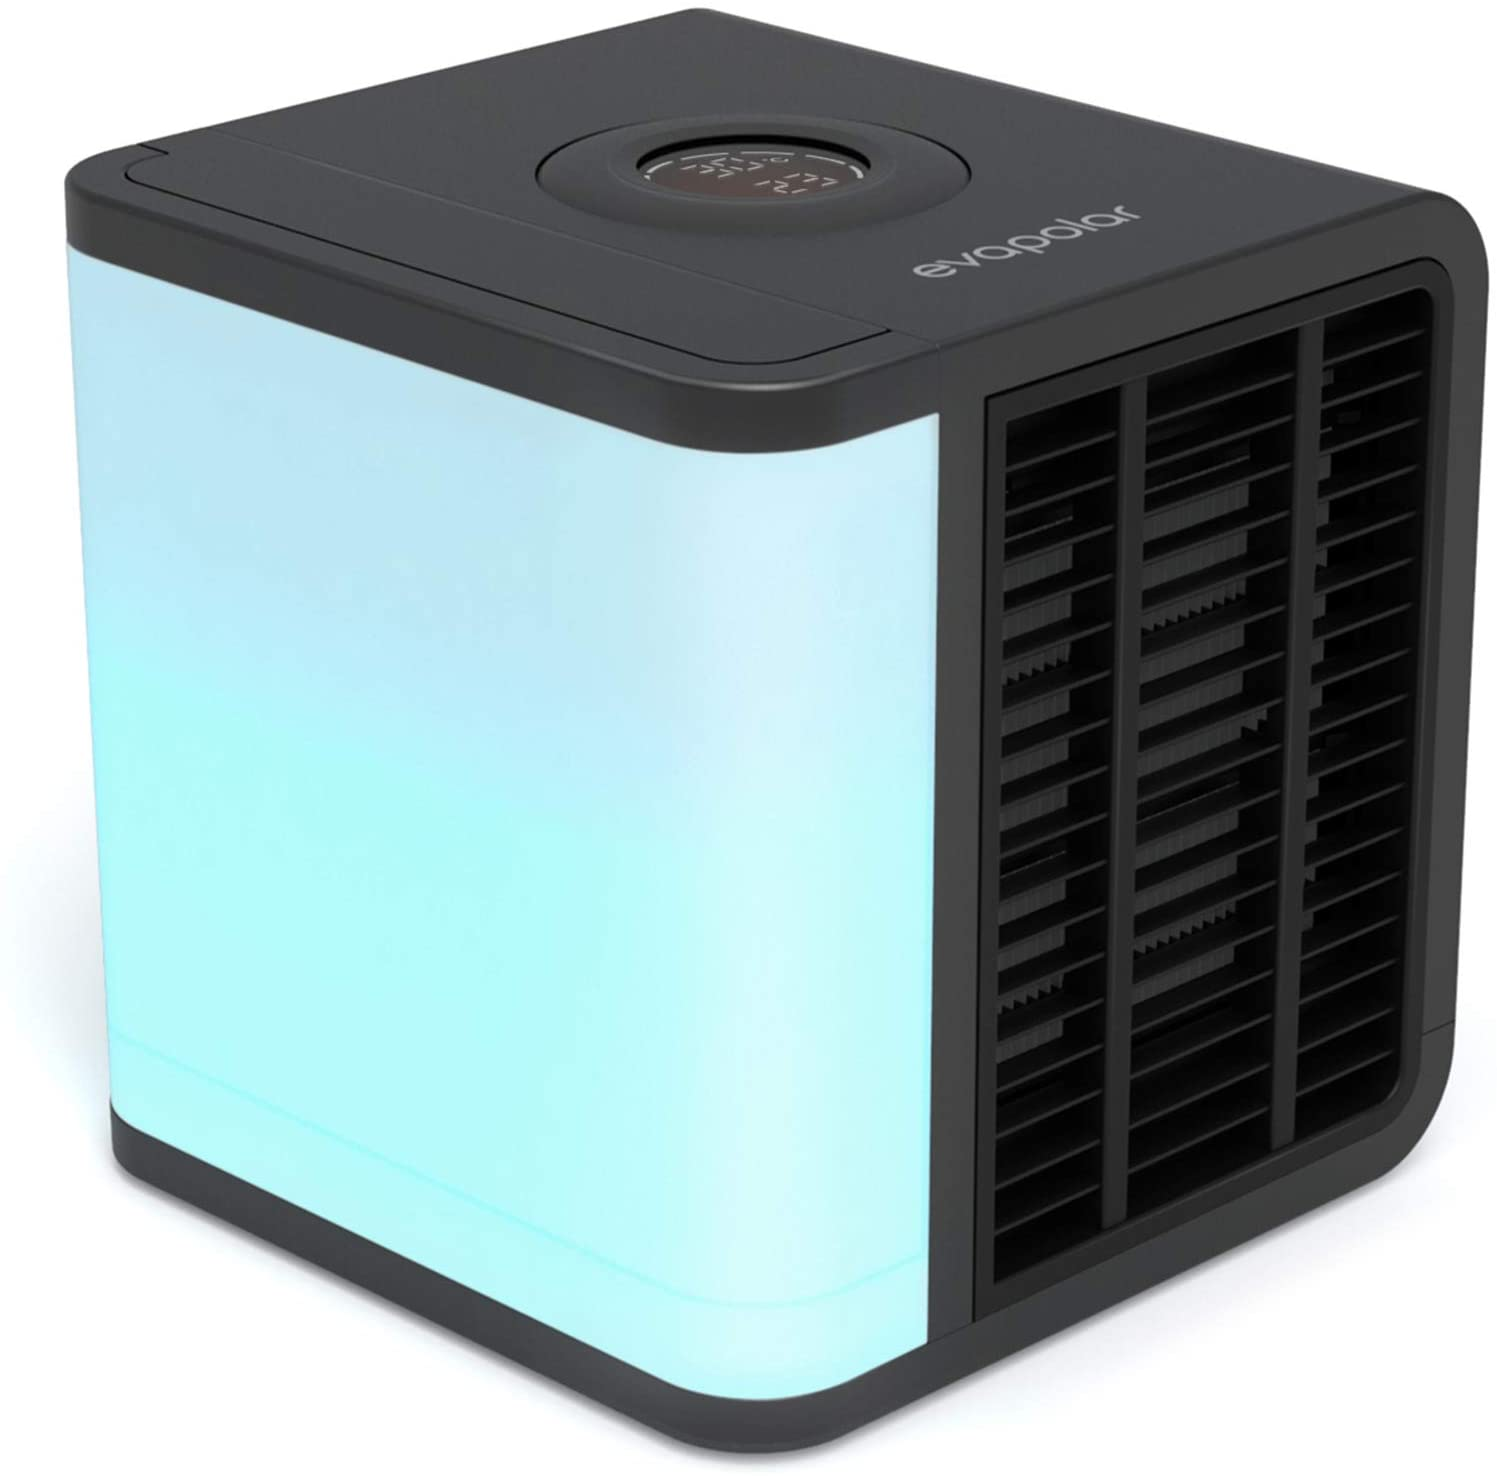 Evapolar EvaLIGHT Plus EV-1500 Personal Evaporative Air Cooler and Humidifier/Portable Air Conditioner, Black